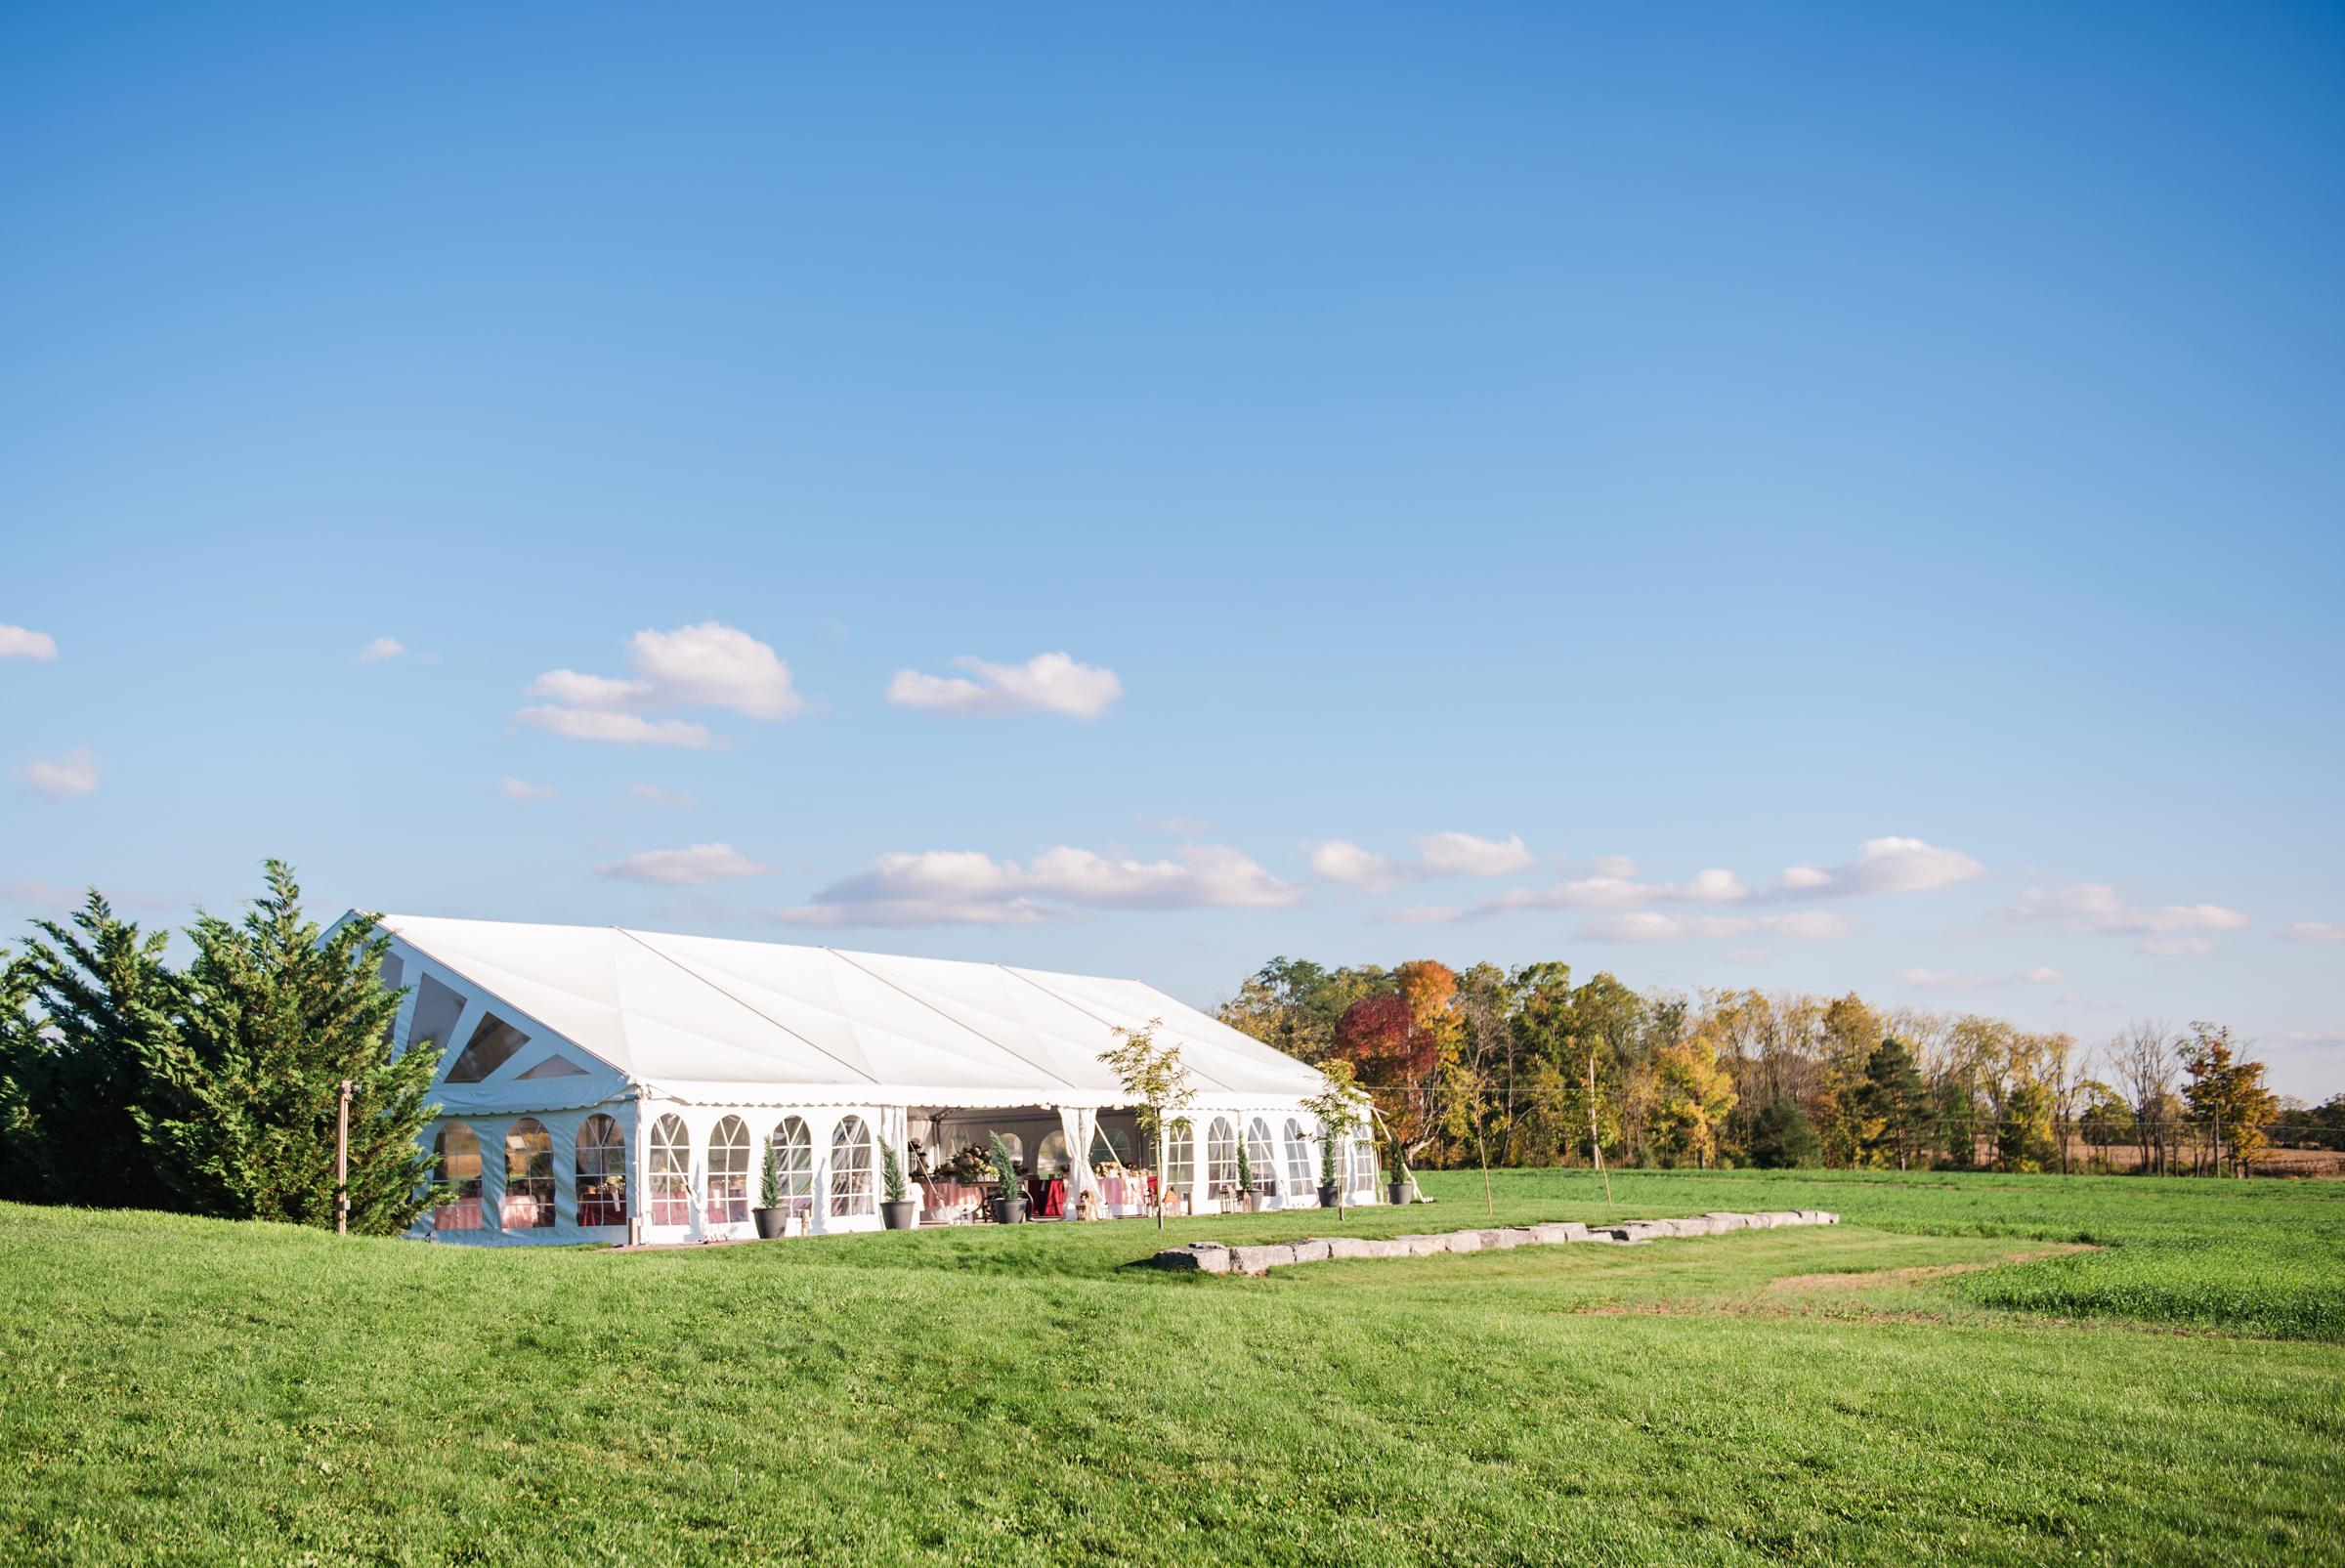 Zugibe_Vineyards_Finger_Lakes_Wedding_JILL_STUDIO_Rochester_NY_Photographer_DSC_3909.jpg